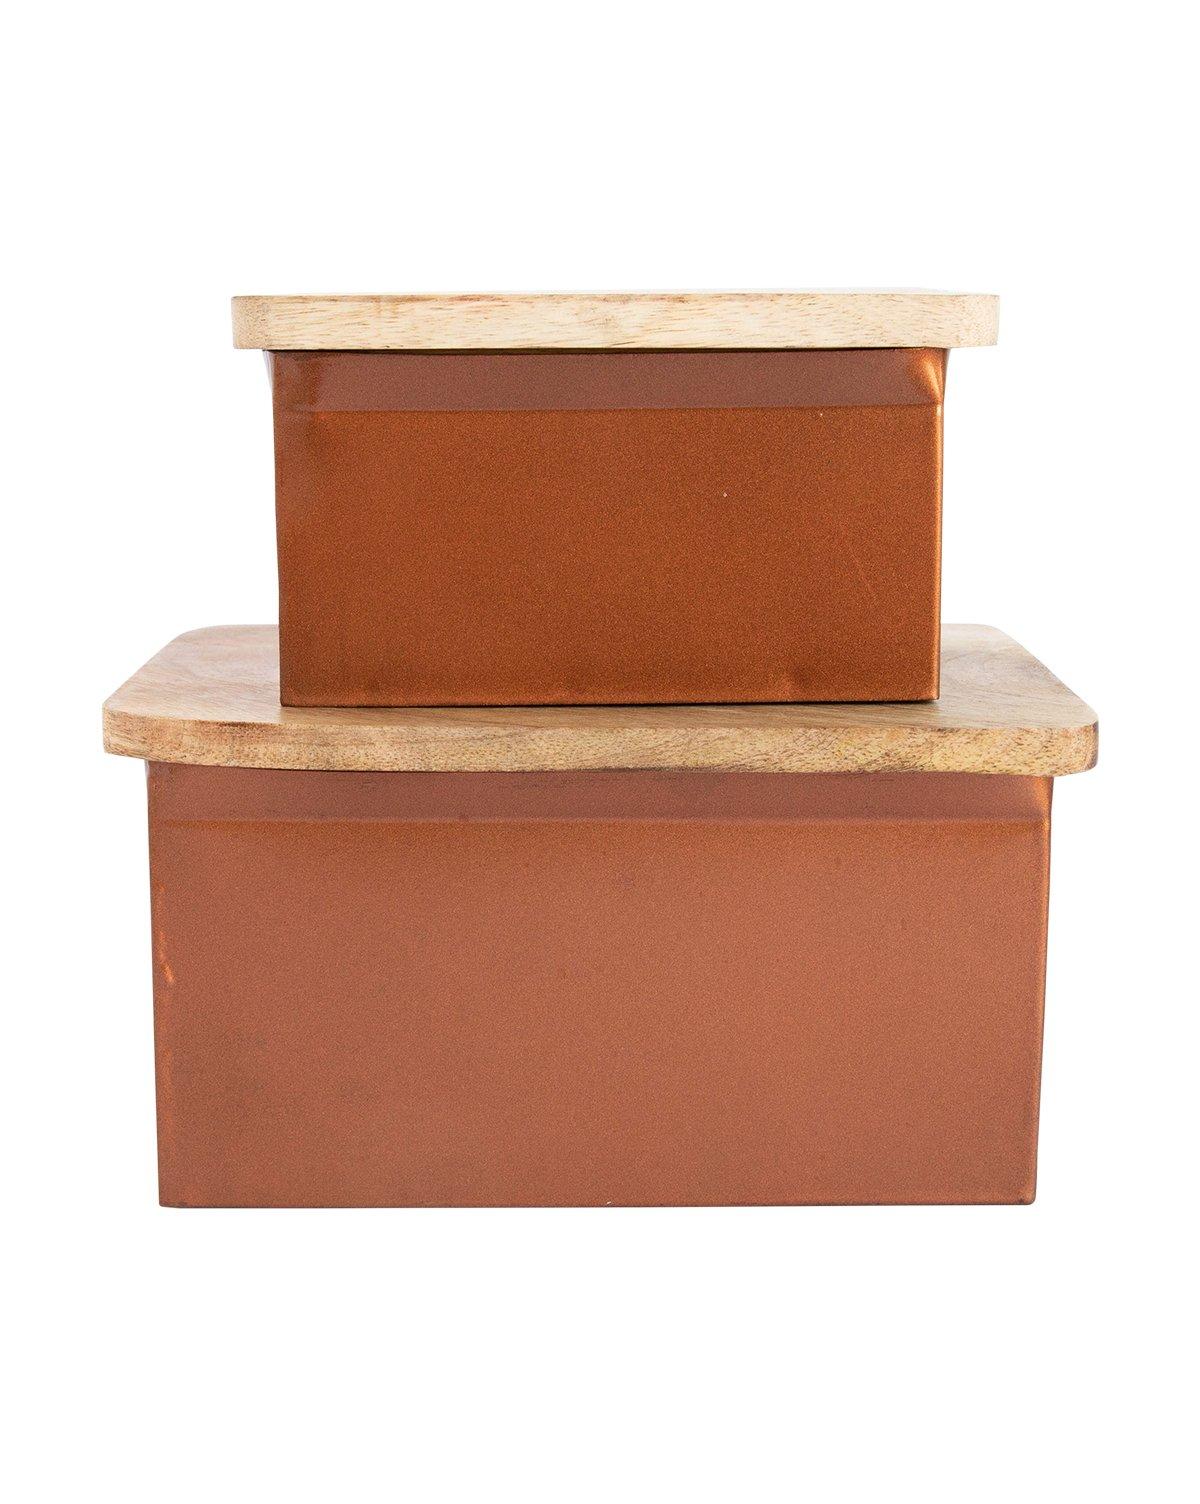 Copper_Boxes_1.jpg